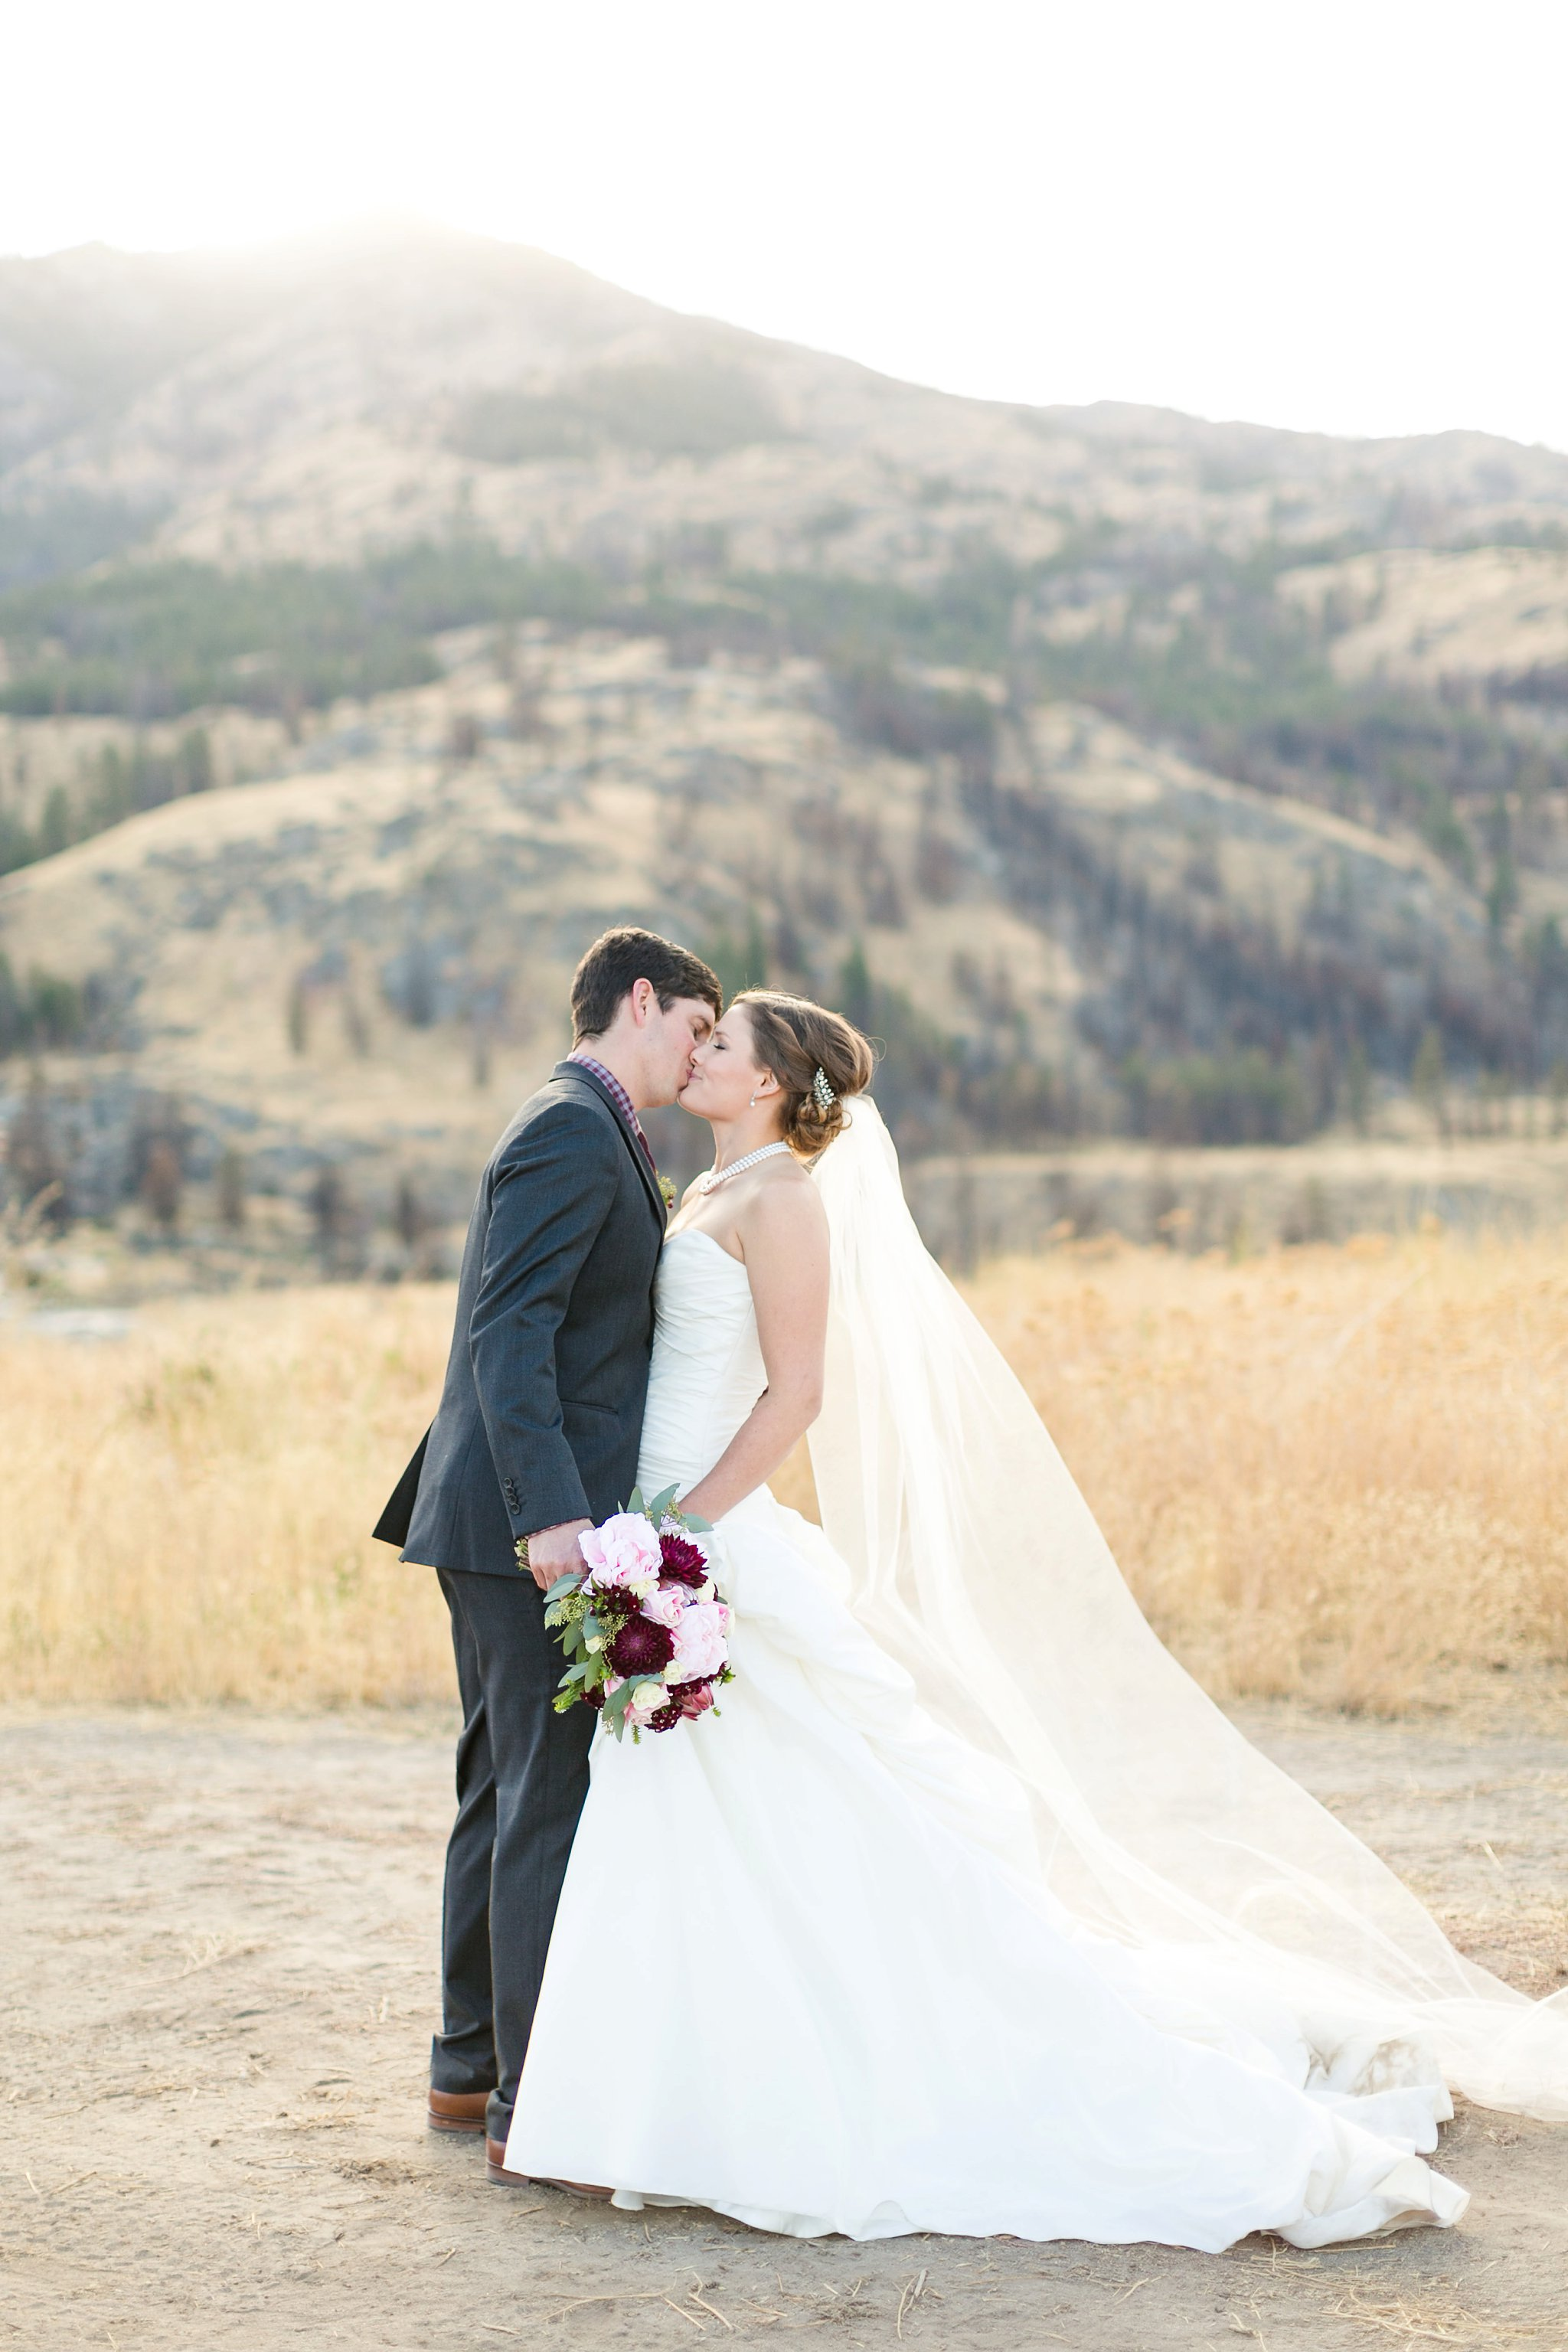 Chelan Washington Wedding Photos Megan Kelsey Photography Delight Wedding Workshop Styled Shoot Annalee & Scot-136.jpg